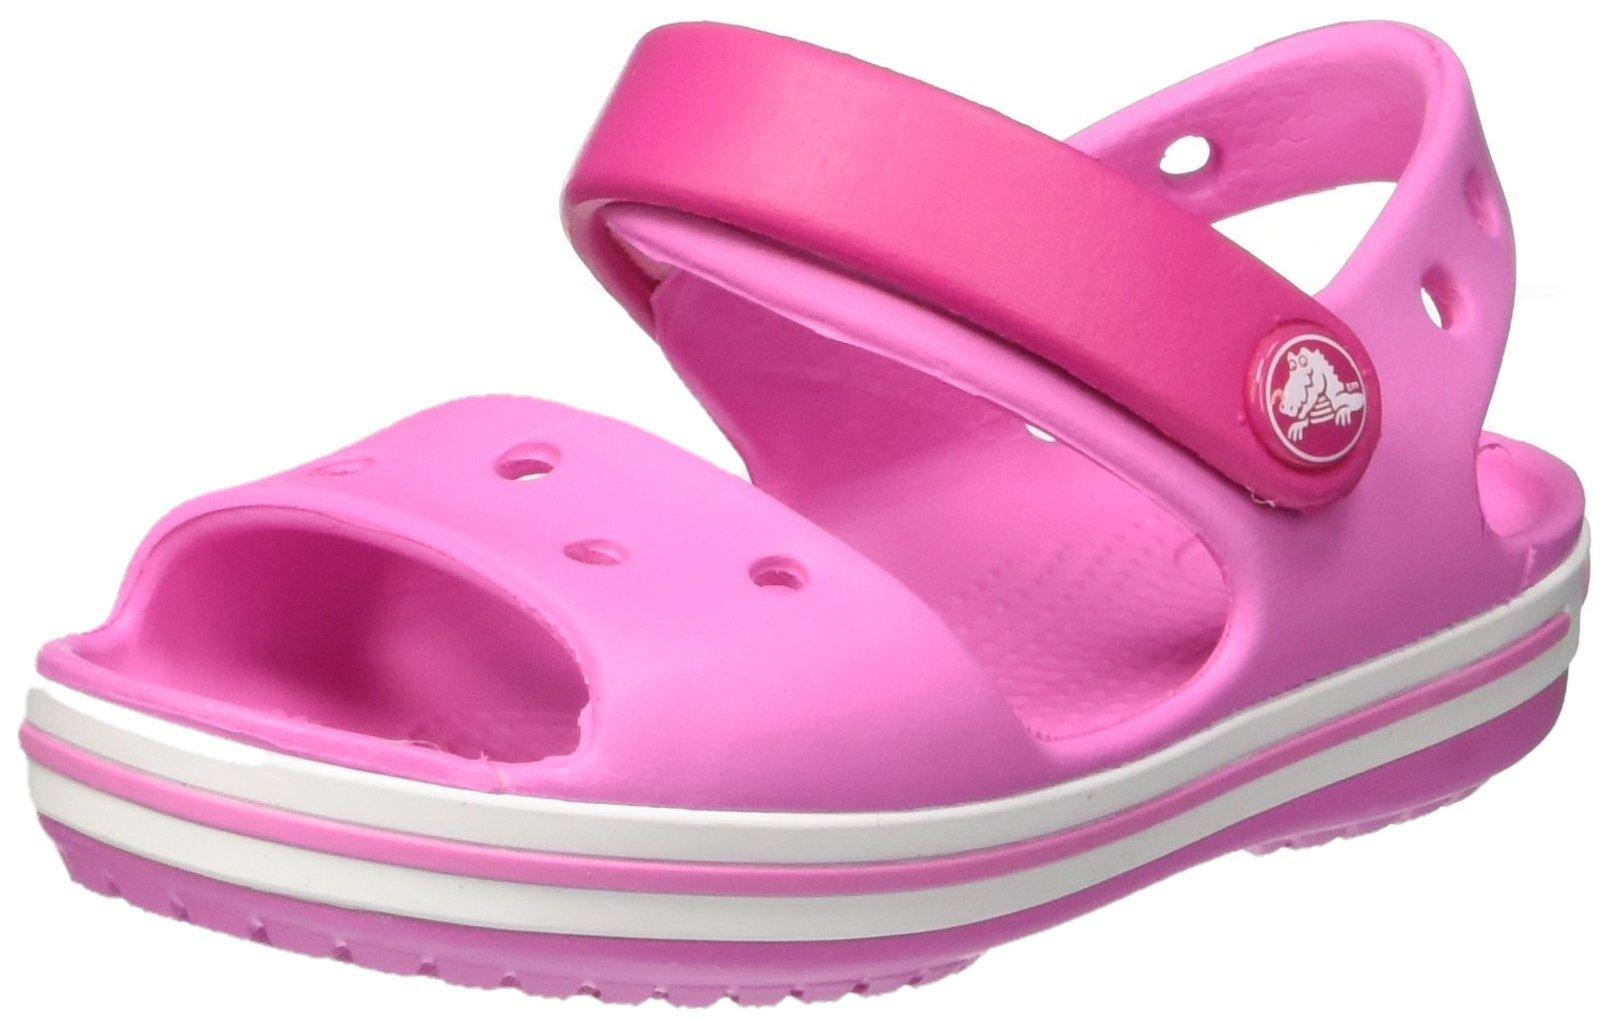 Crocs Crocband  Fun Lab   Light-Up Clog, Pink, C6 M US Toddler